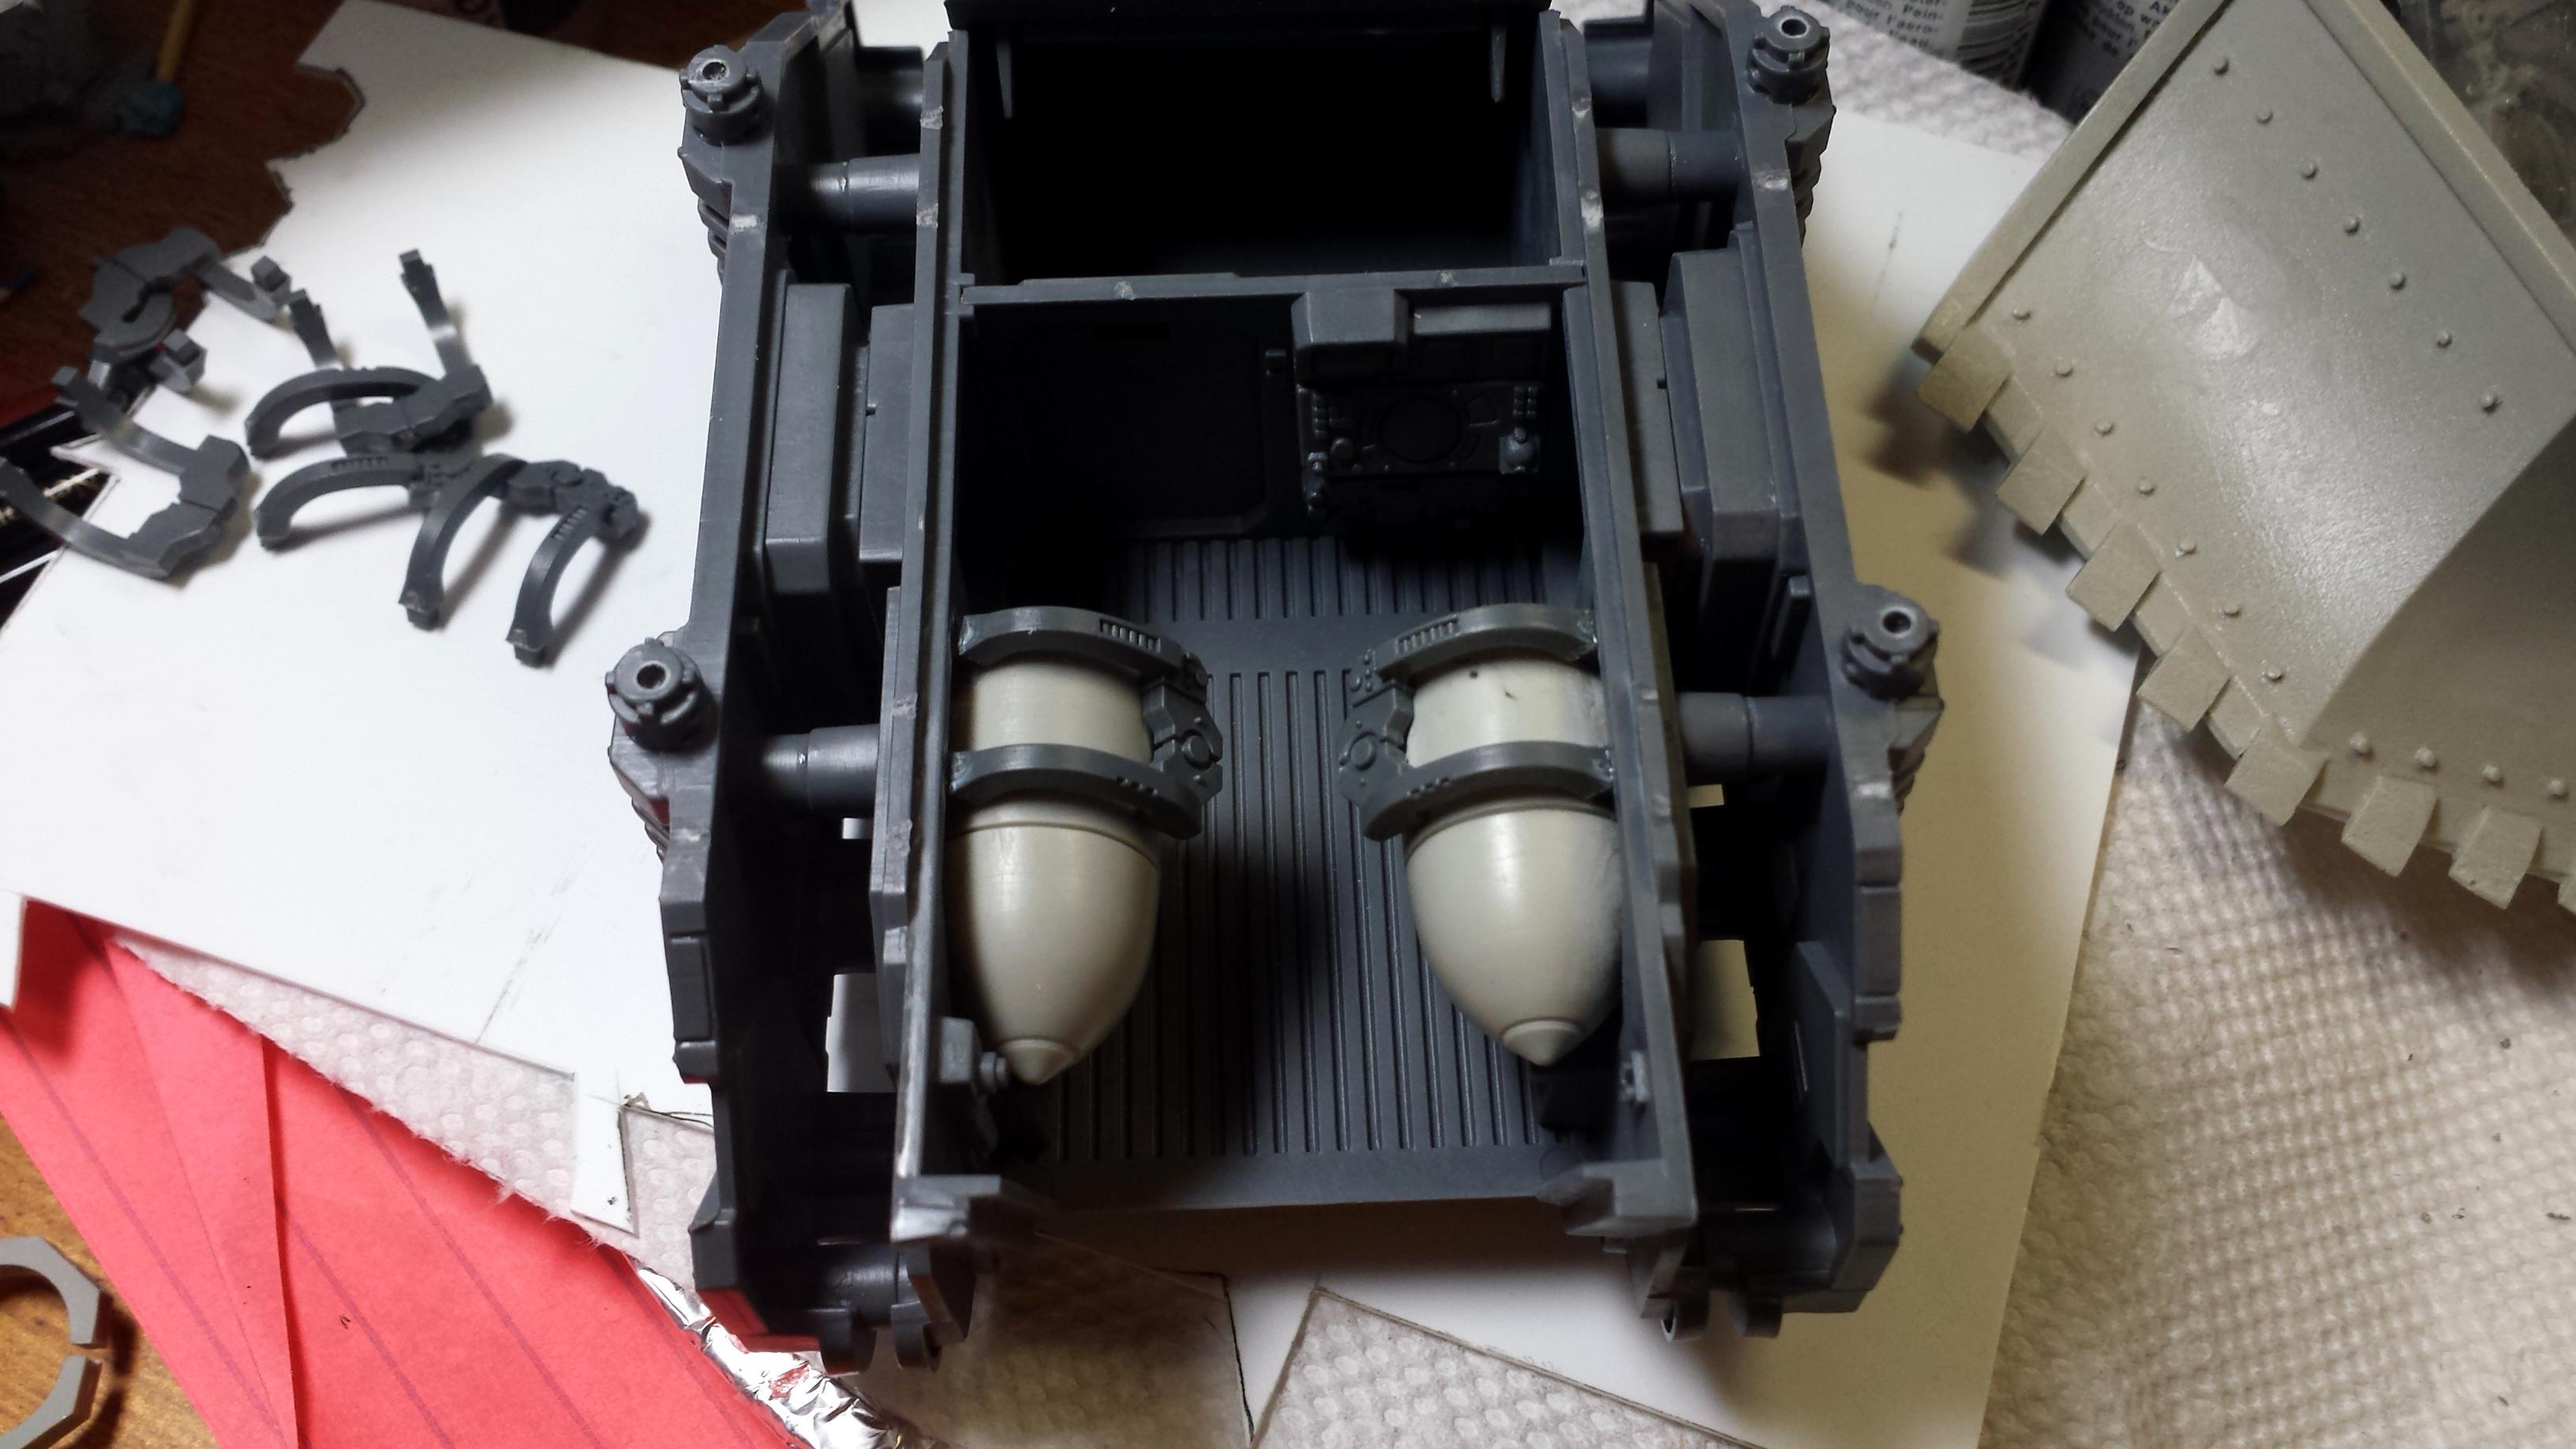 Conversion, Razorback, Rhino, Space Marines, Support Vehicle, Vindicator